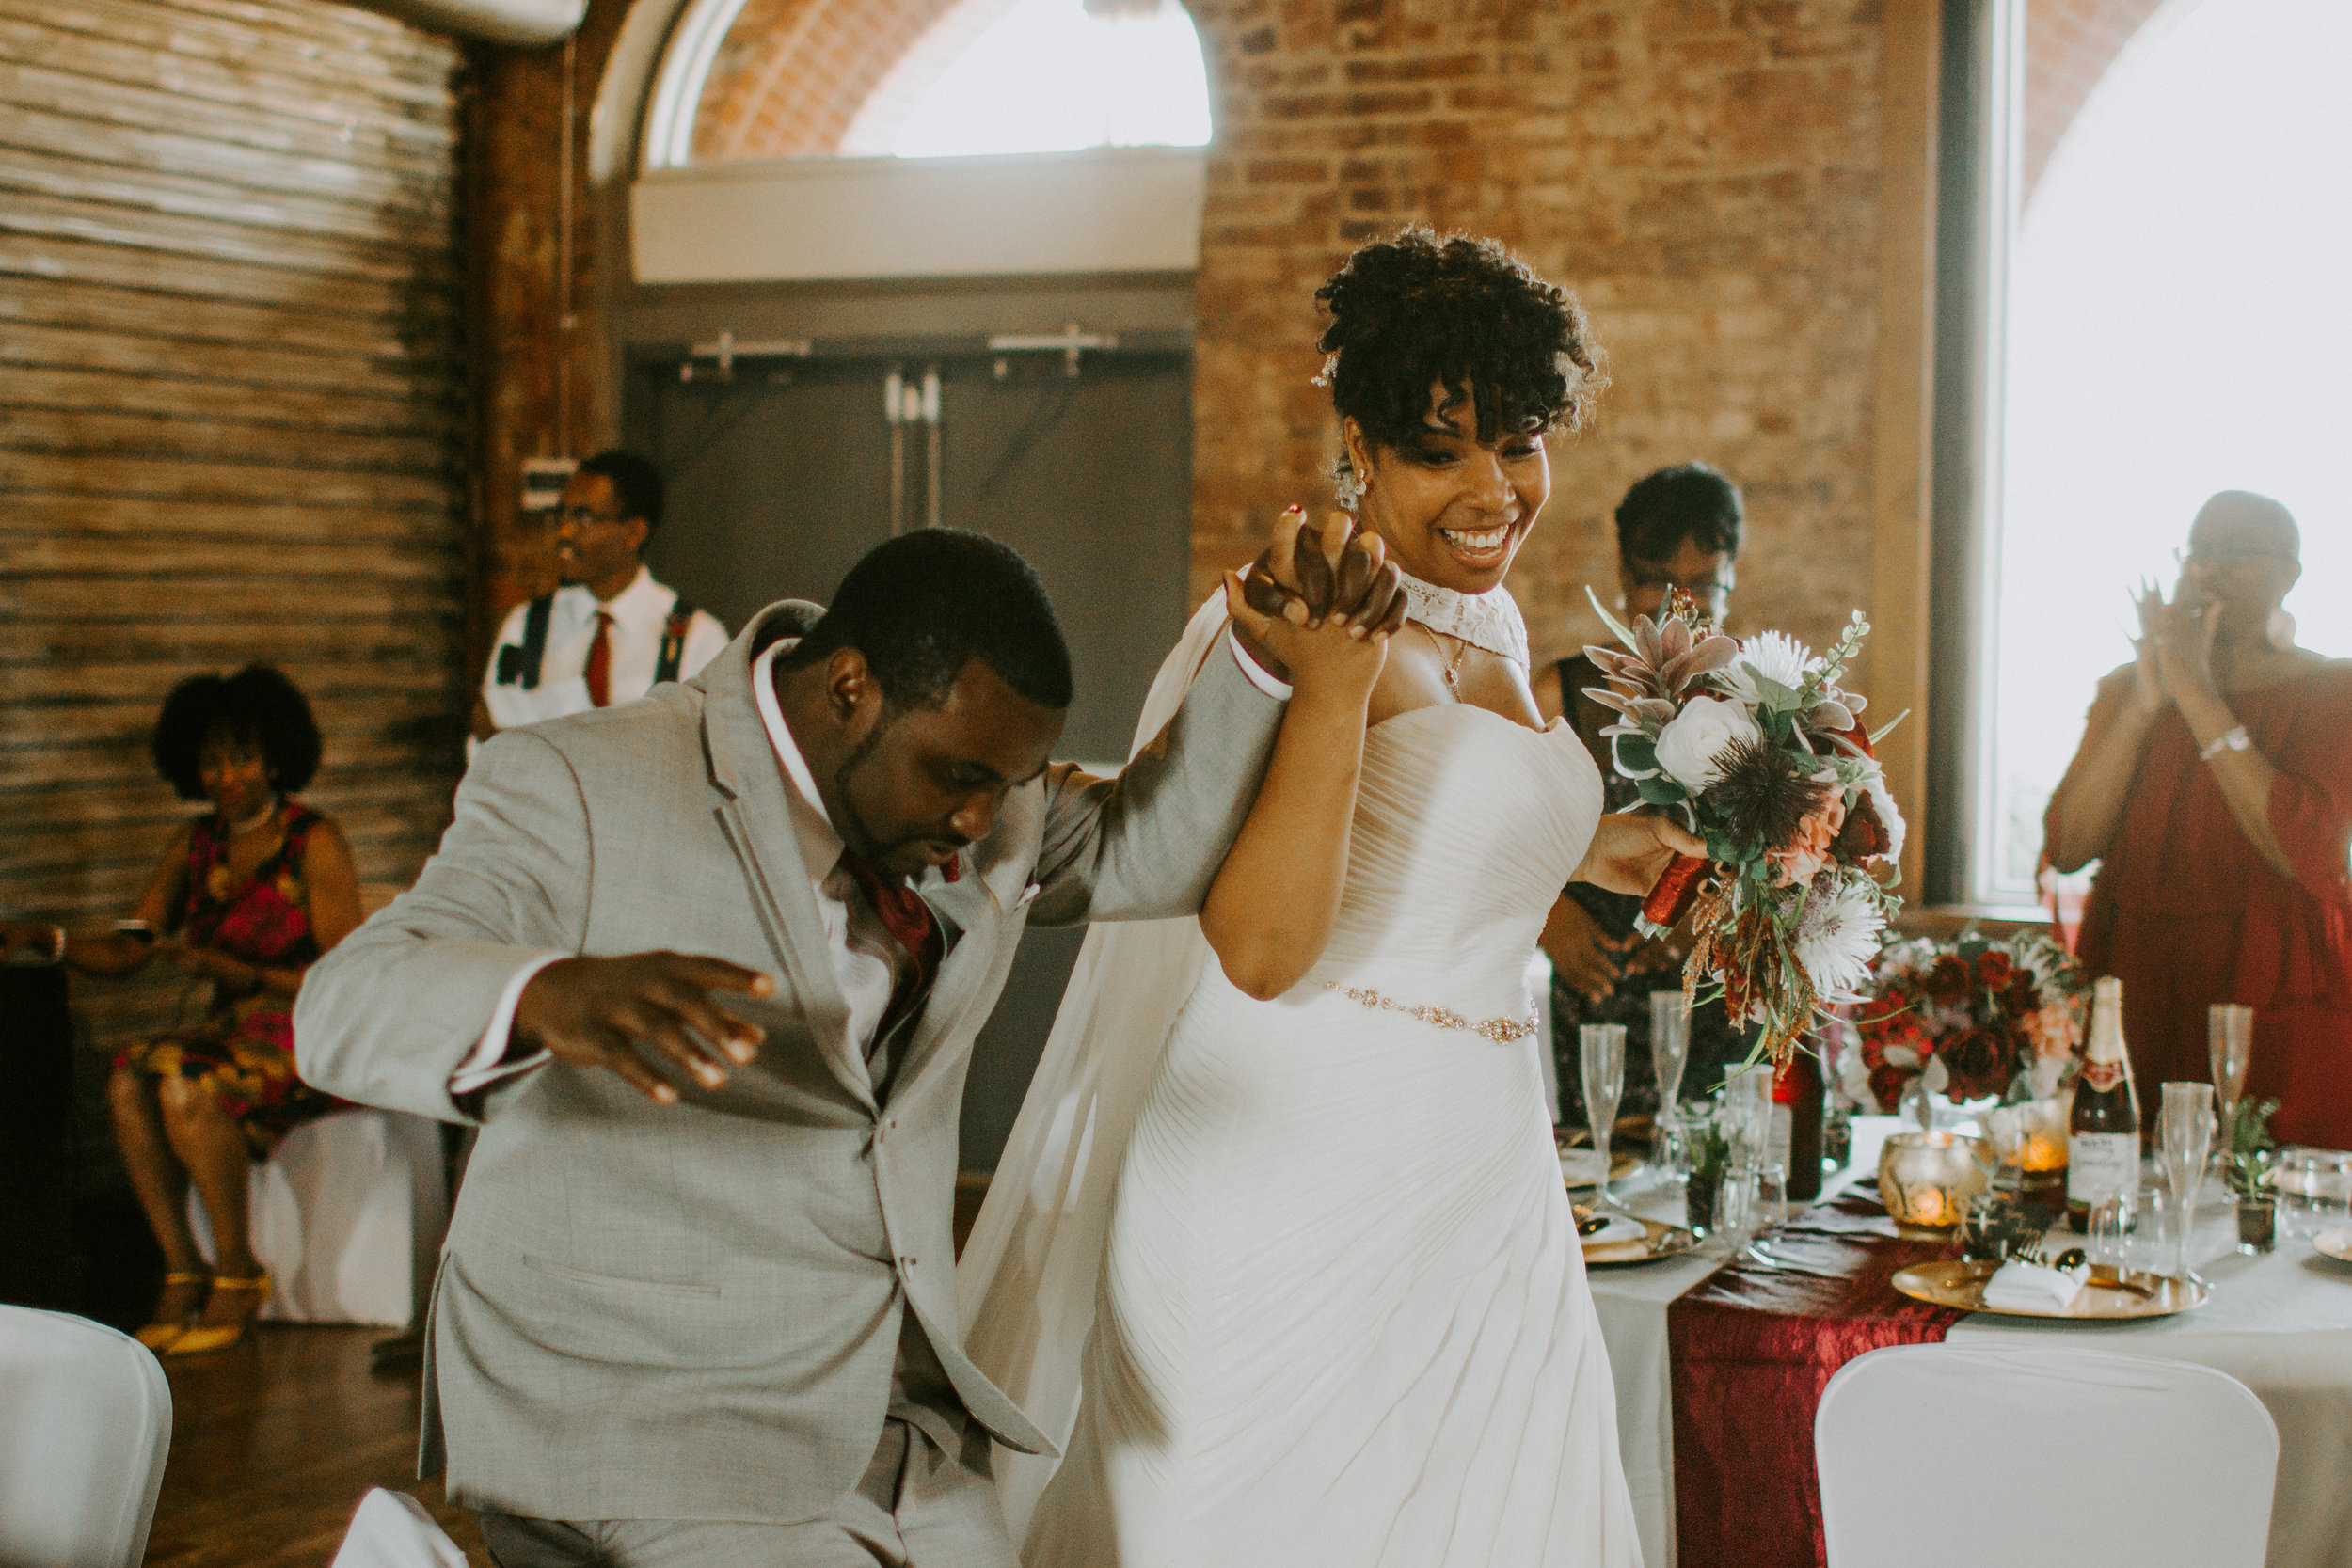 WonderlyCreative_Wedding_6.7.18_Khara&Dwayne_-825.jpg